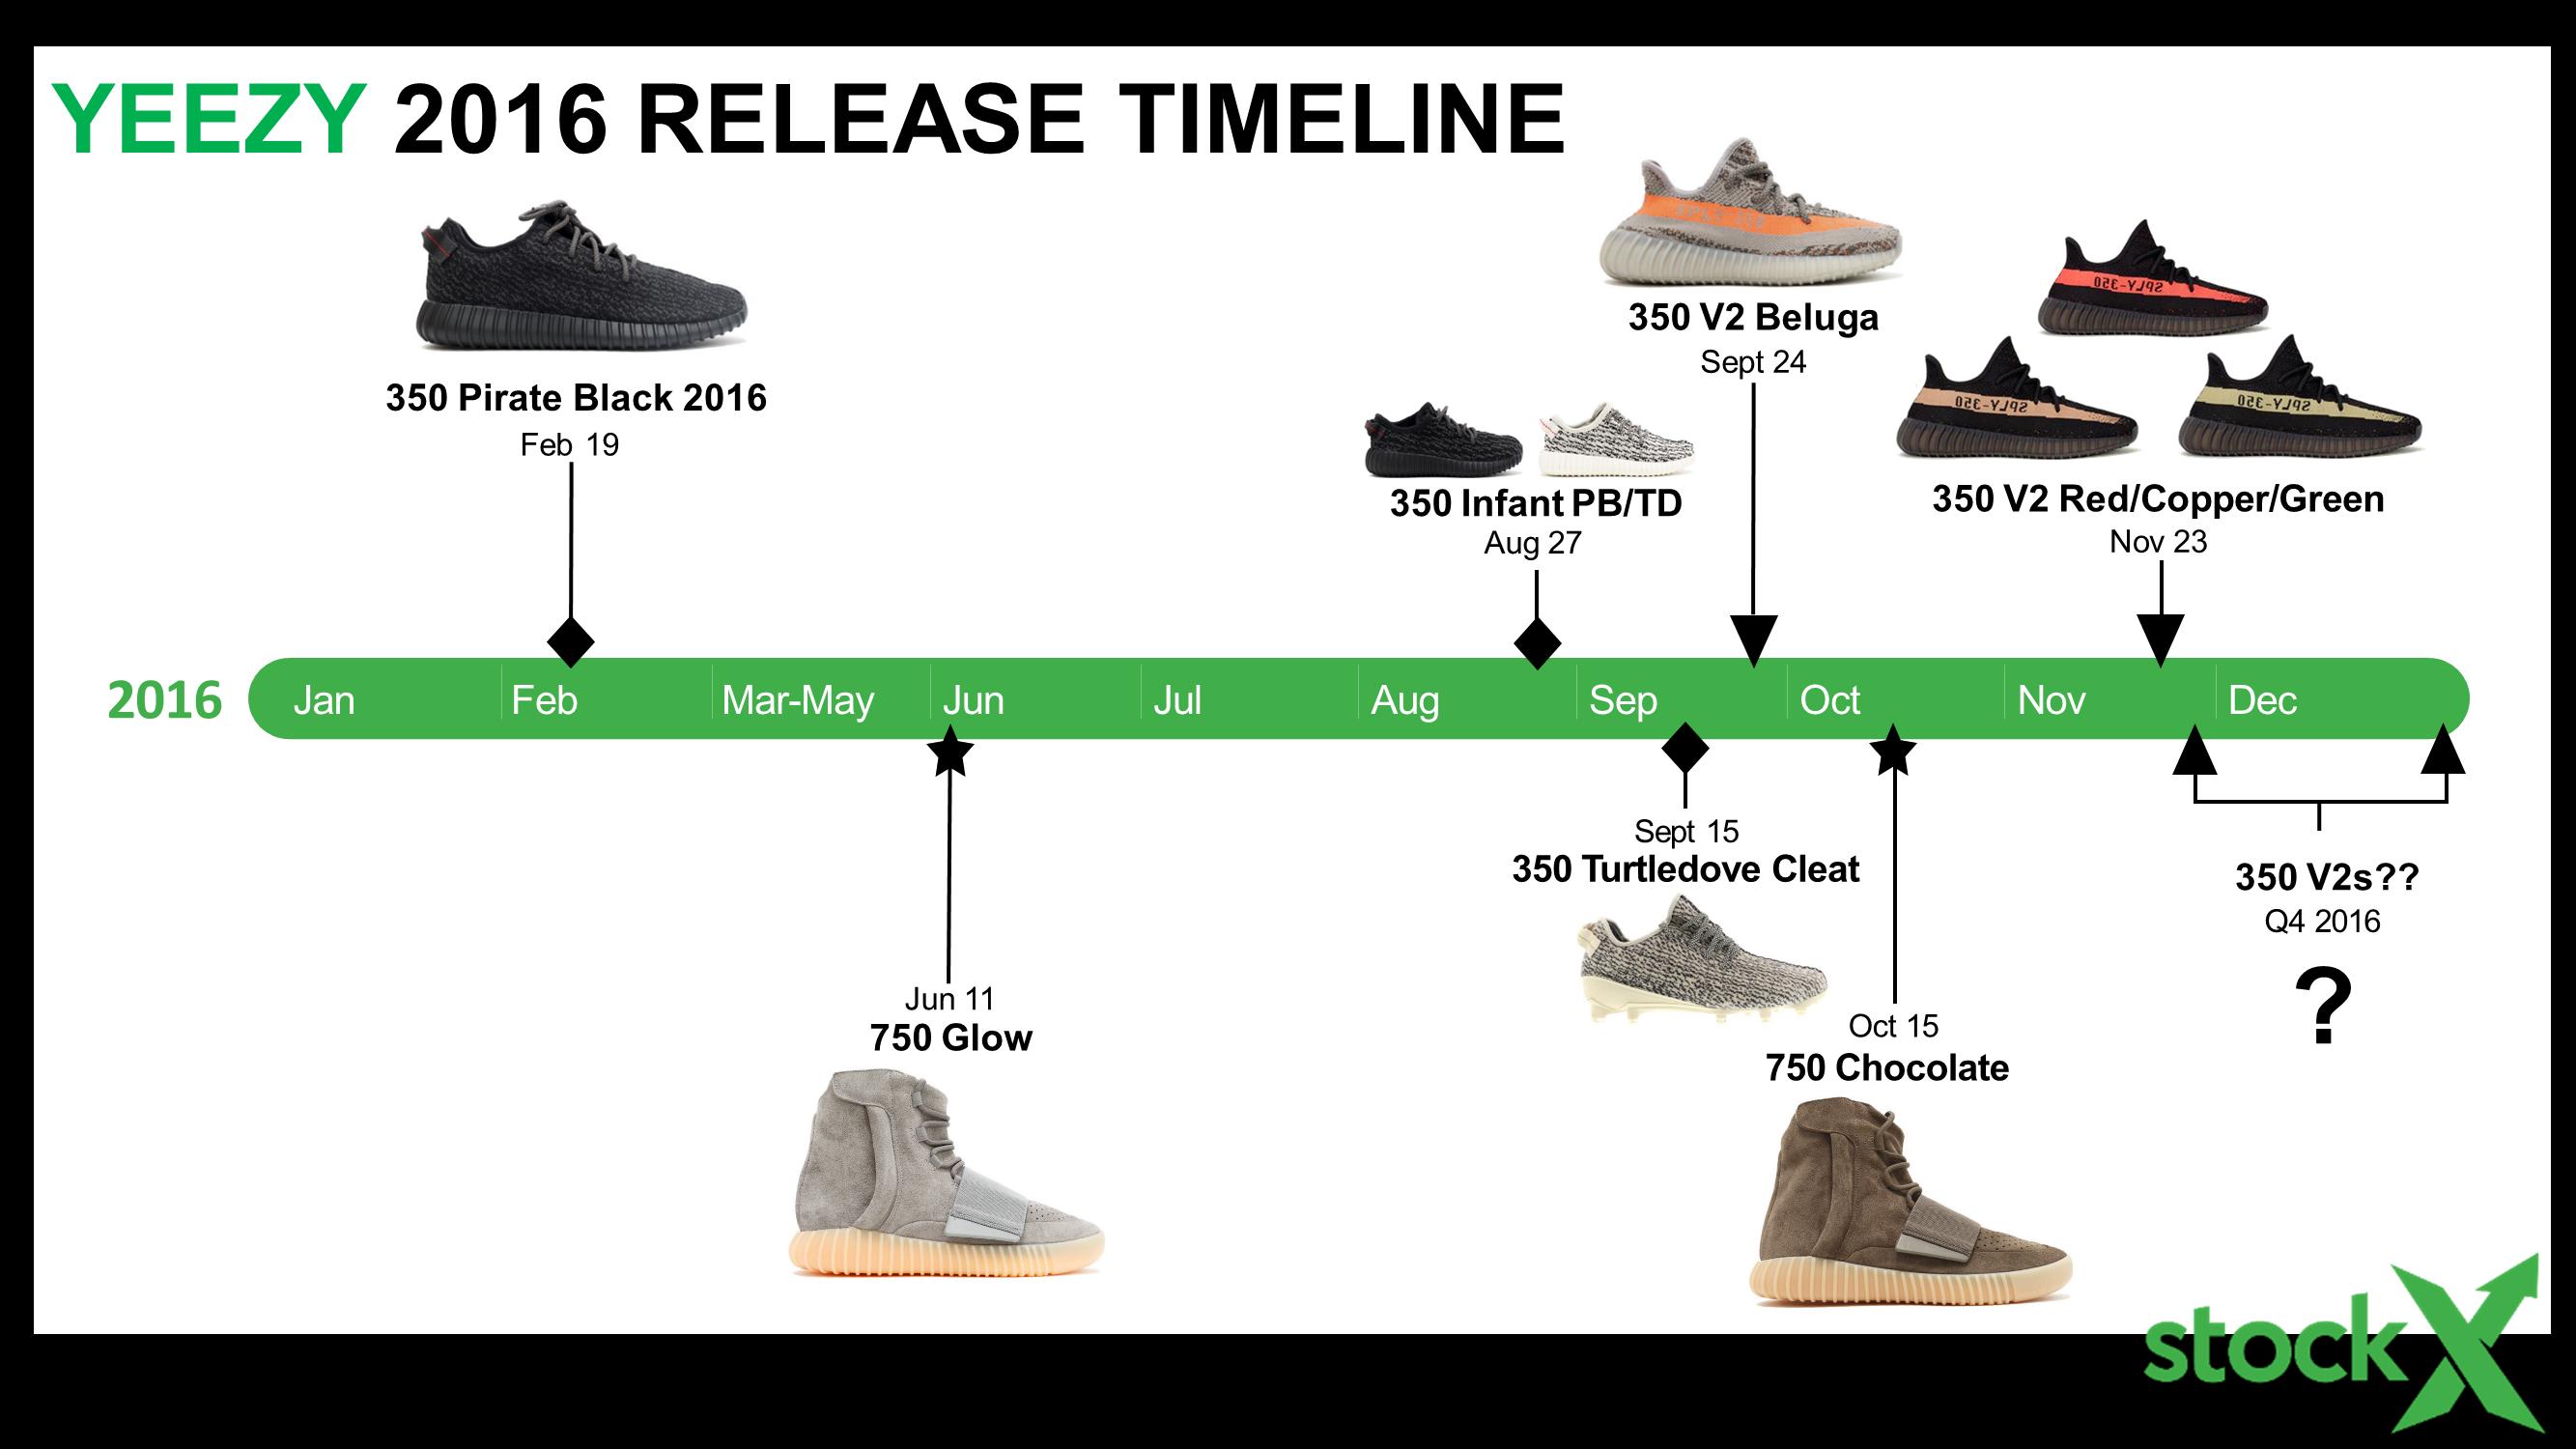 Yeezy 2016 Timeline